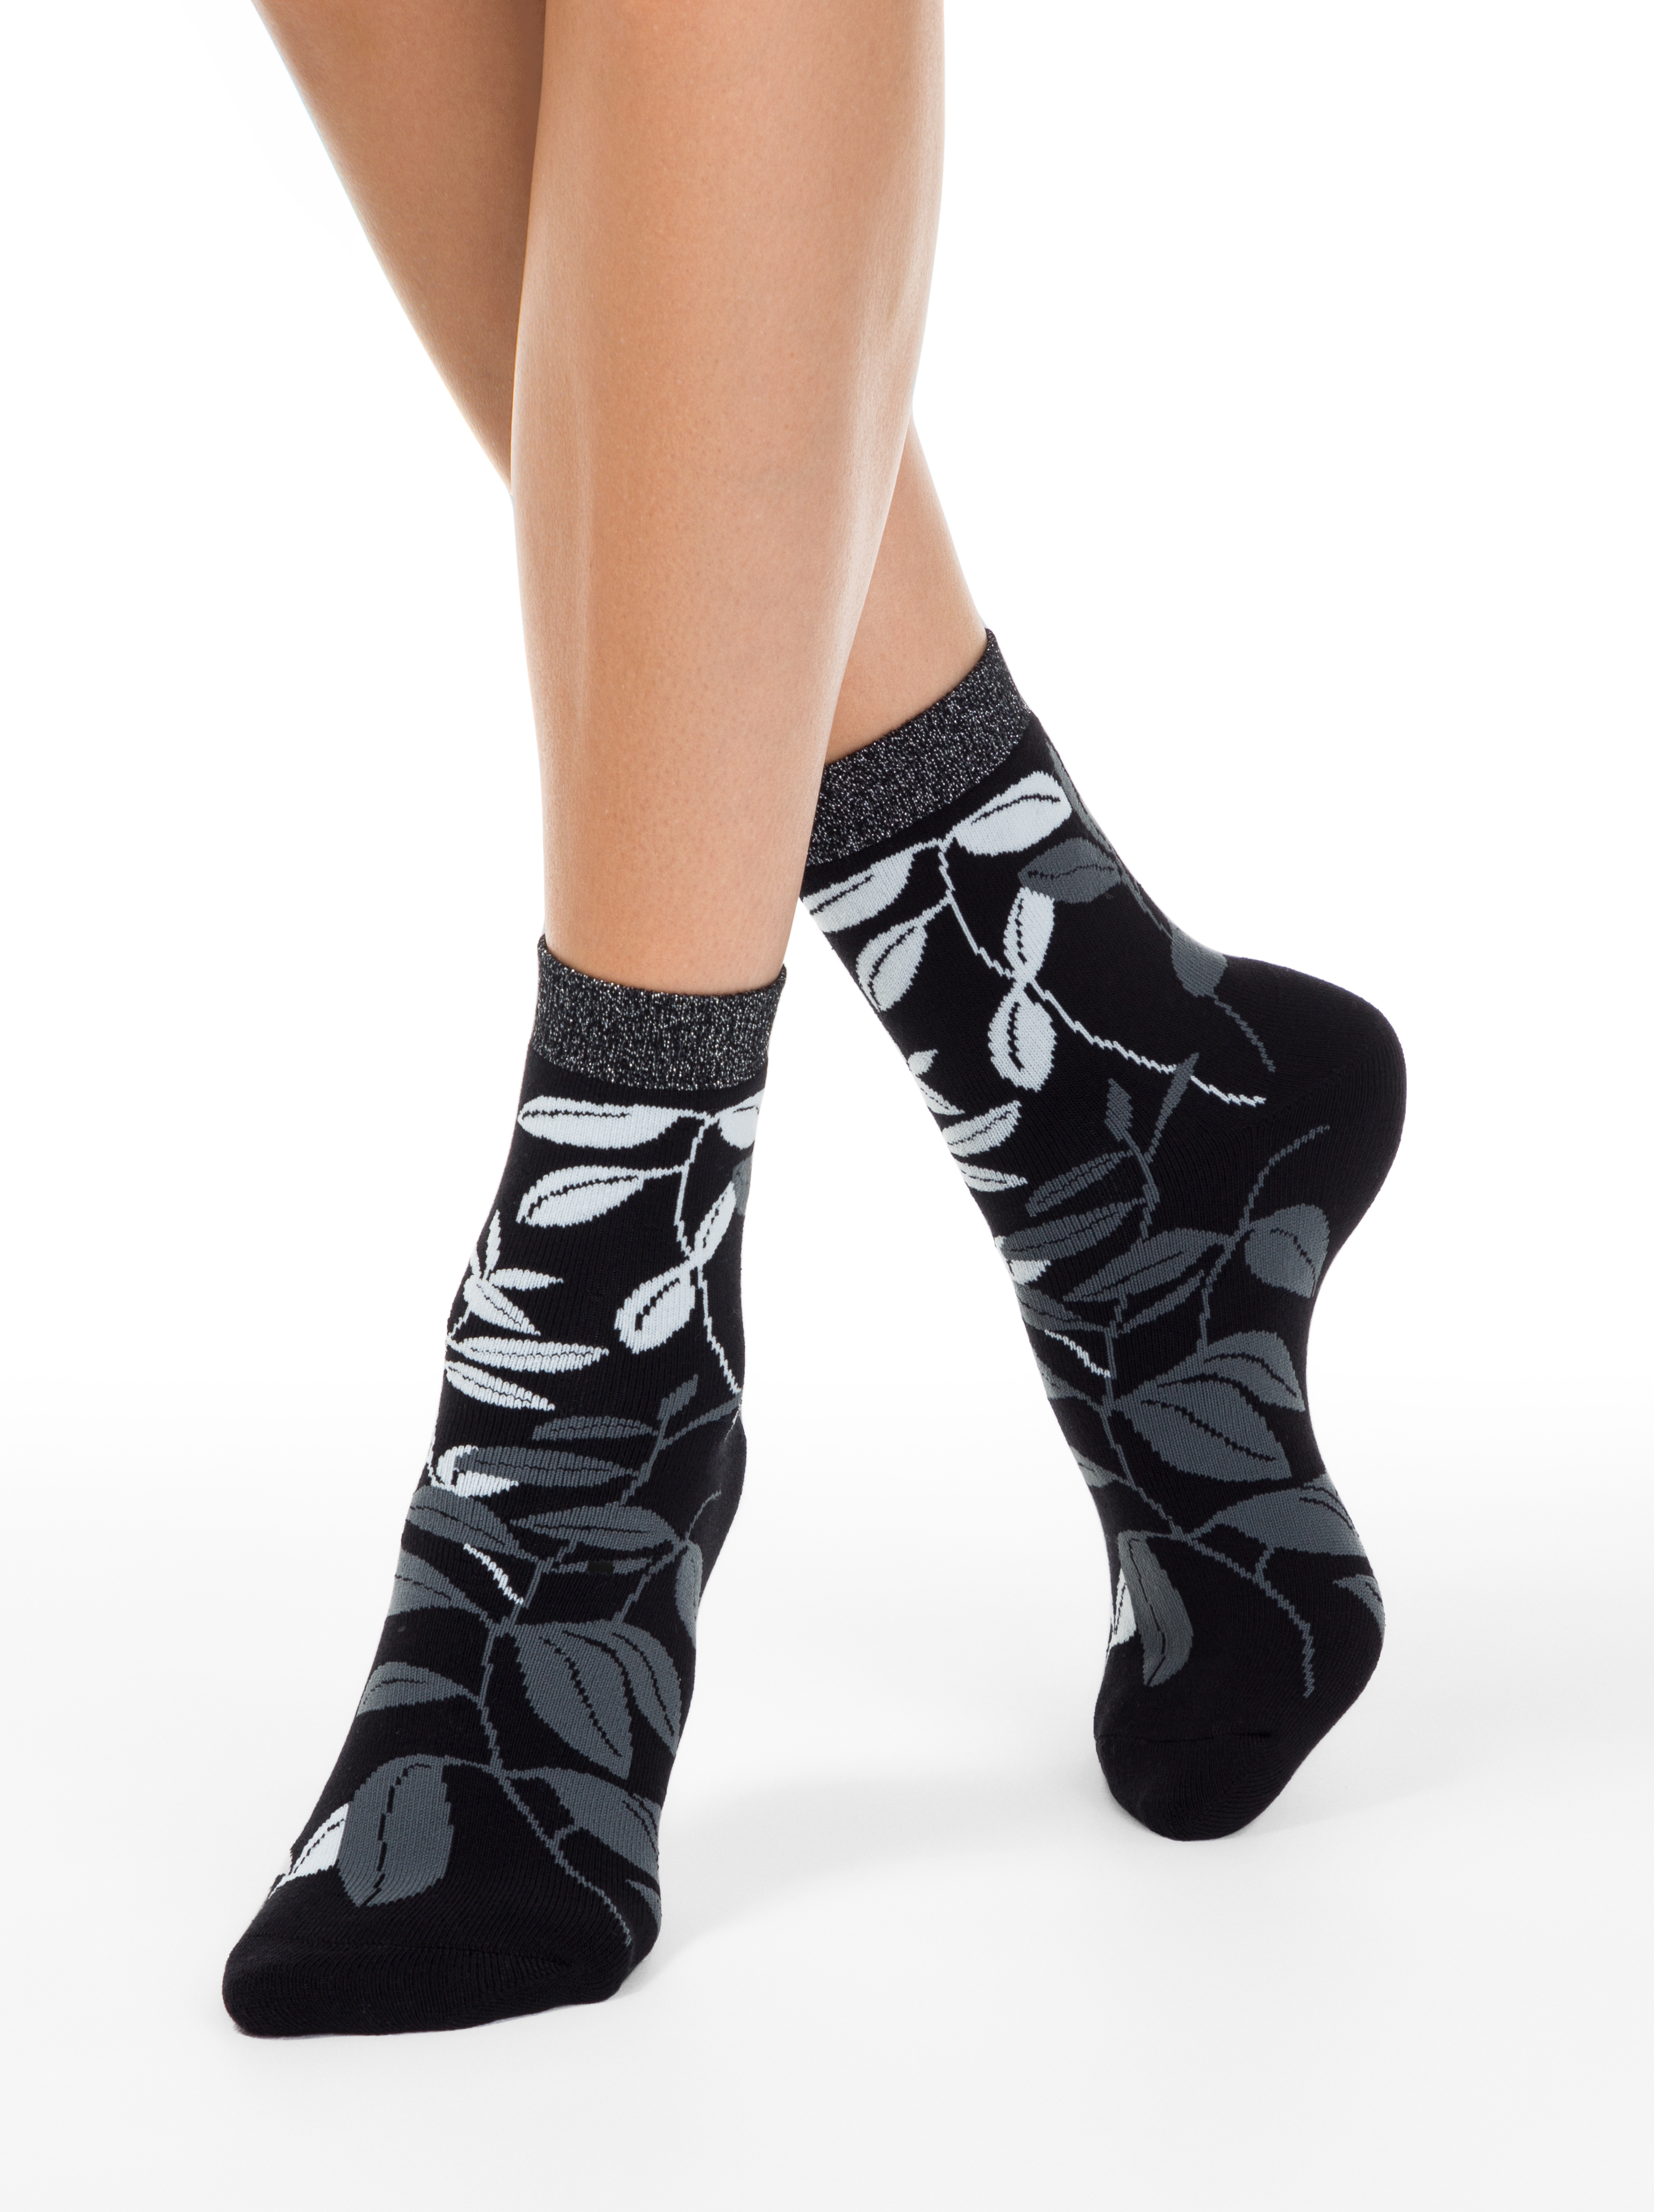 Носки женские ⭐️ Махровые носки COMFORT ⭐️